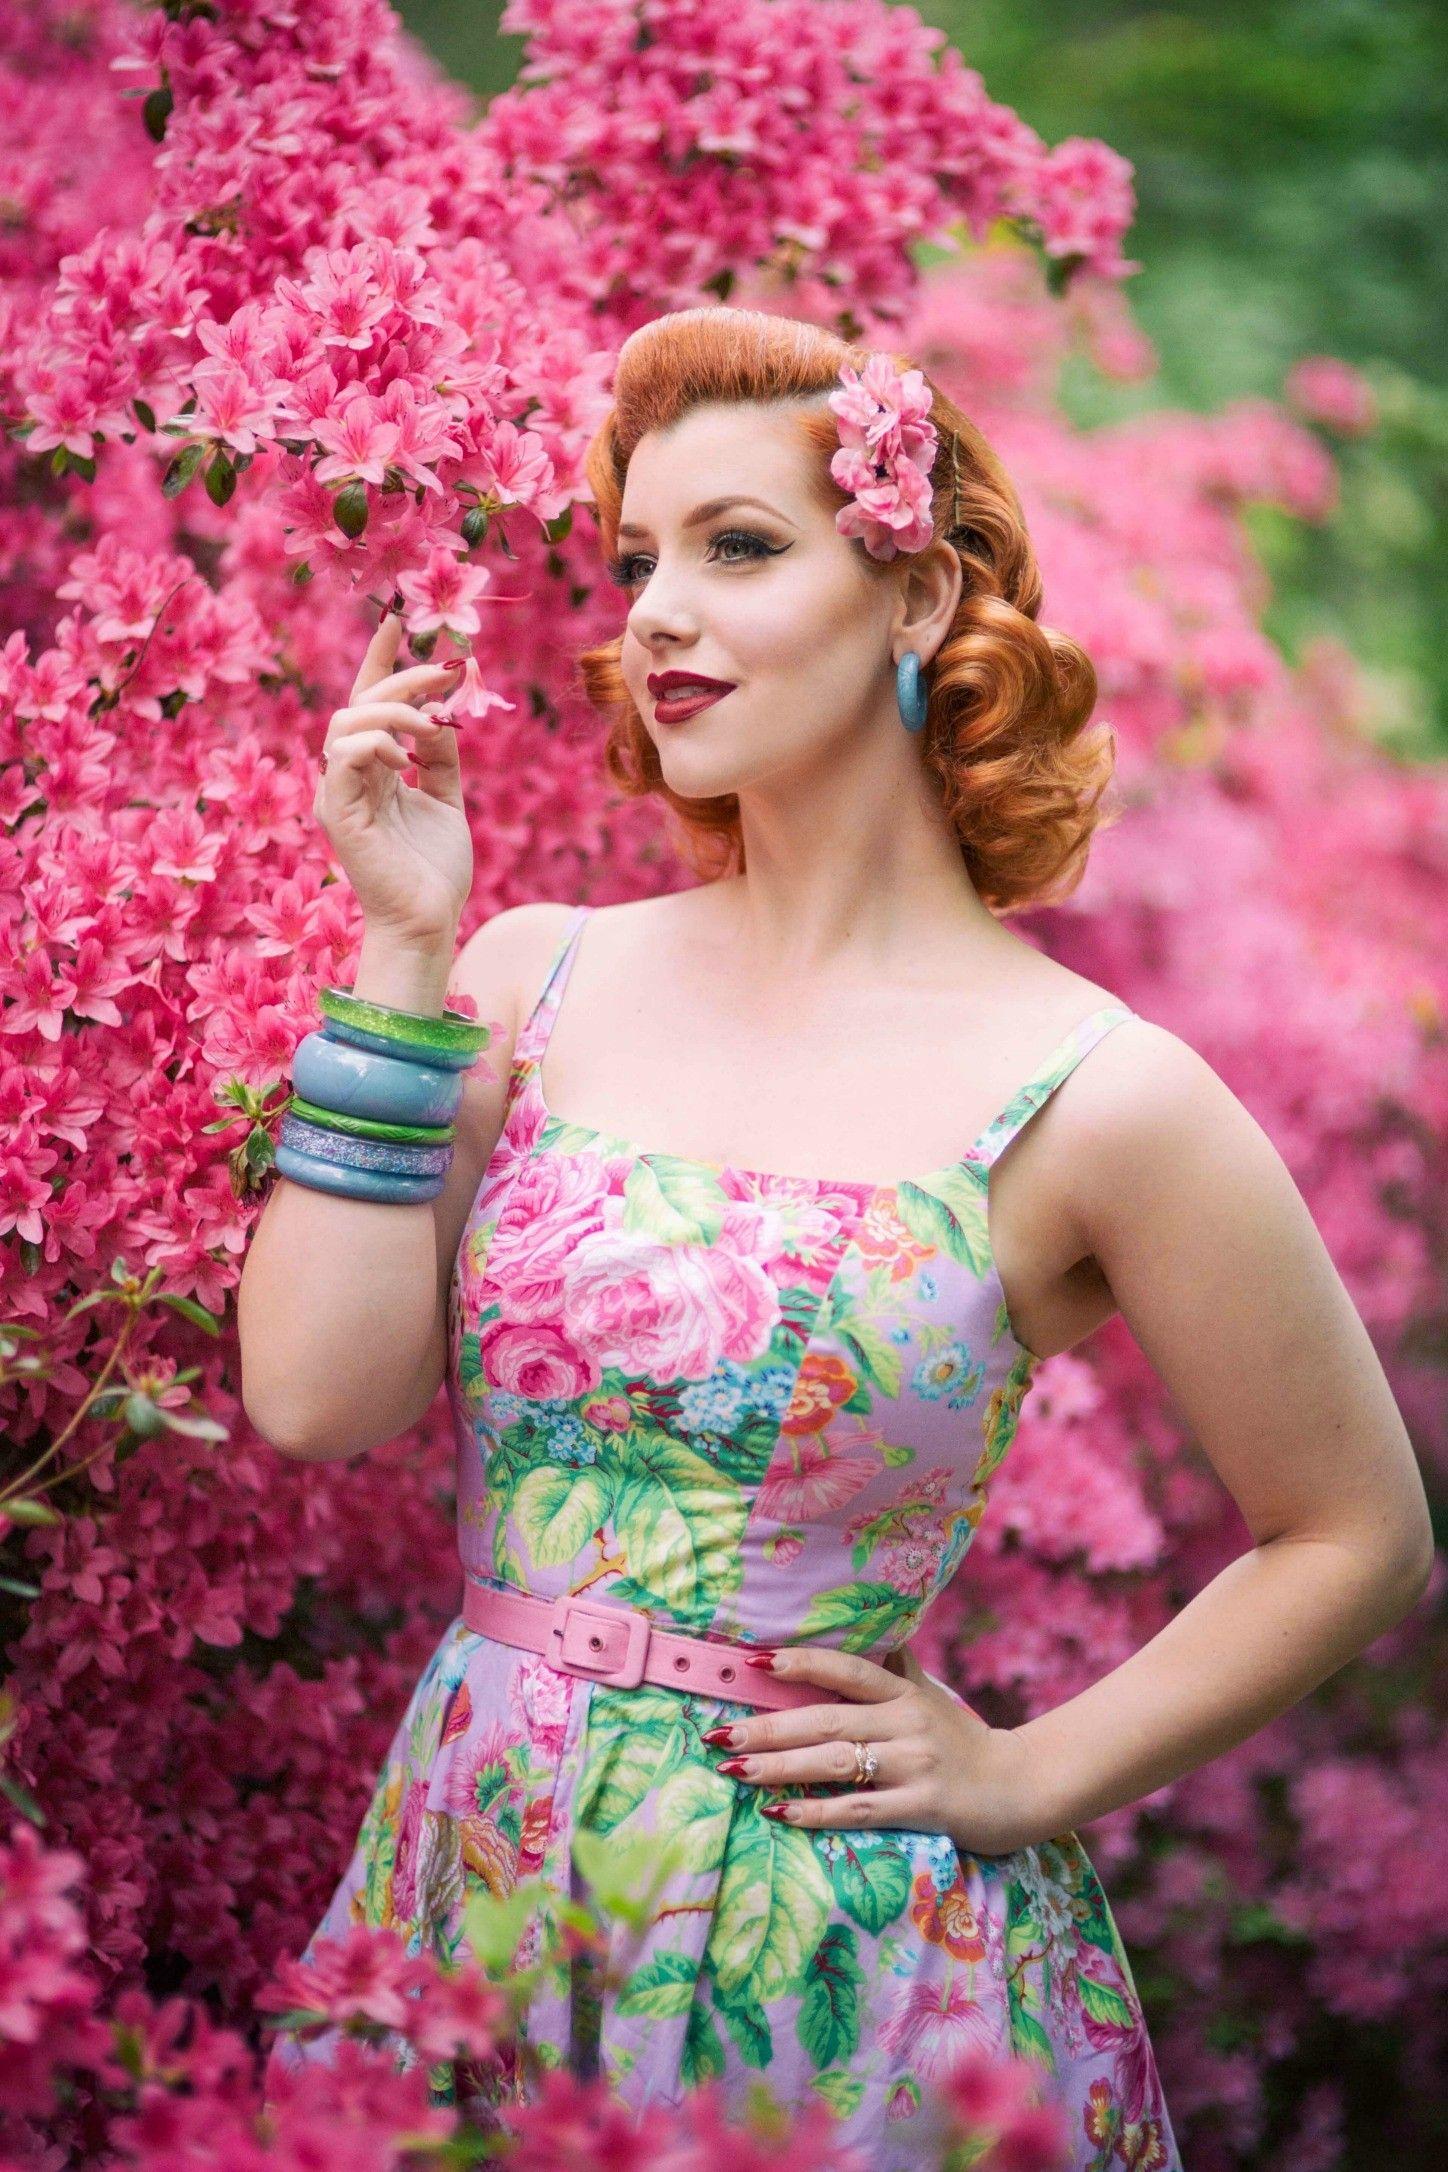 Swing dresses vintage style dress floral dress pinup